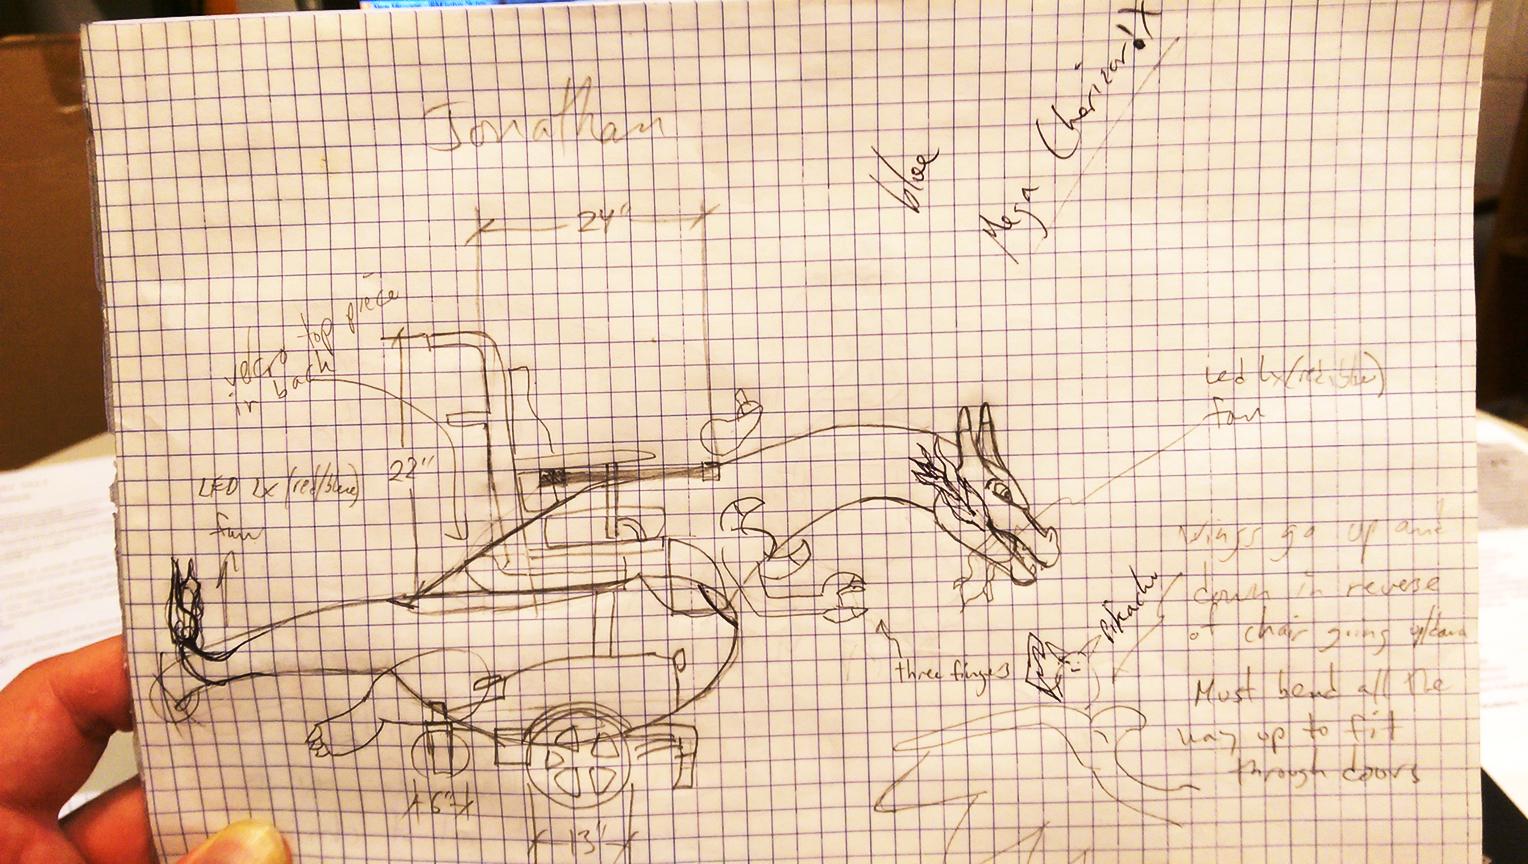 Pokémon Charizard begins on paper...